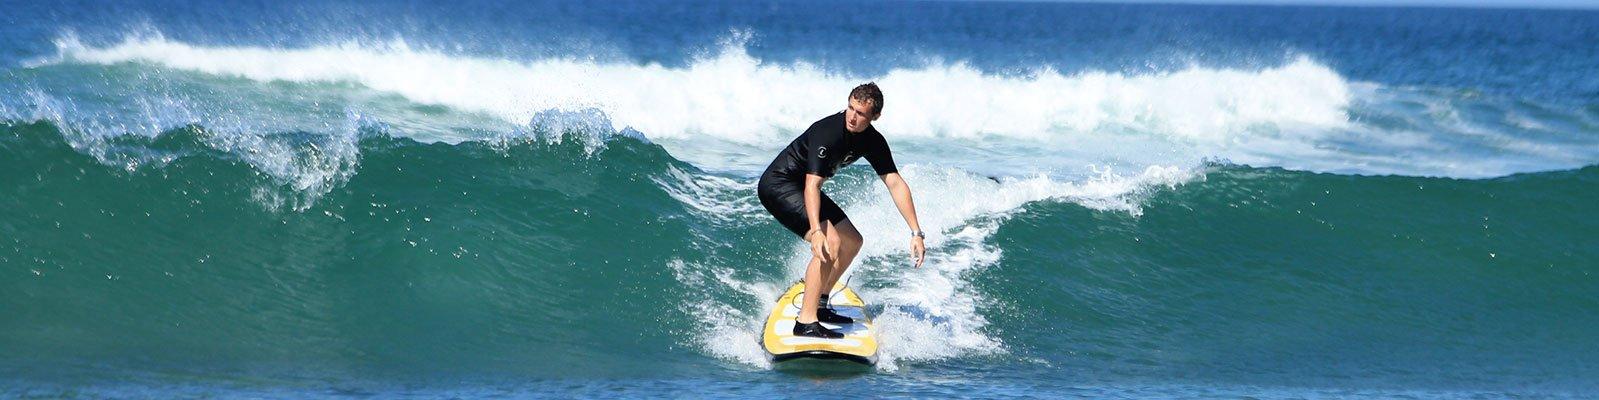 intensive surf coaching program